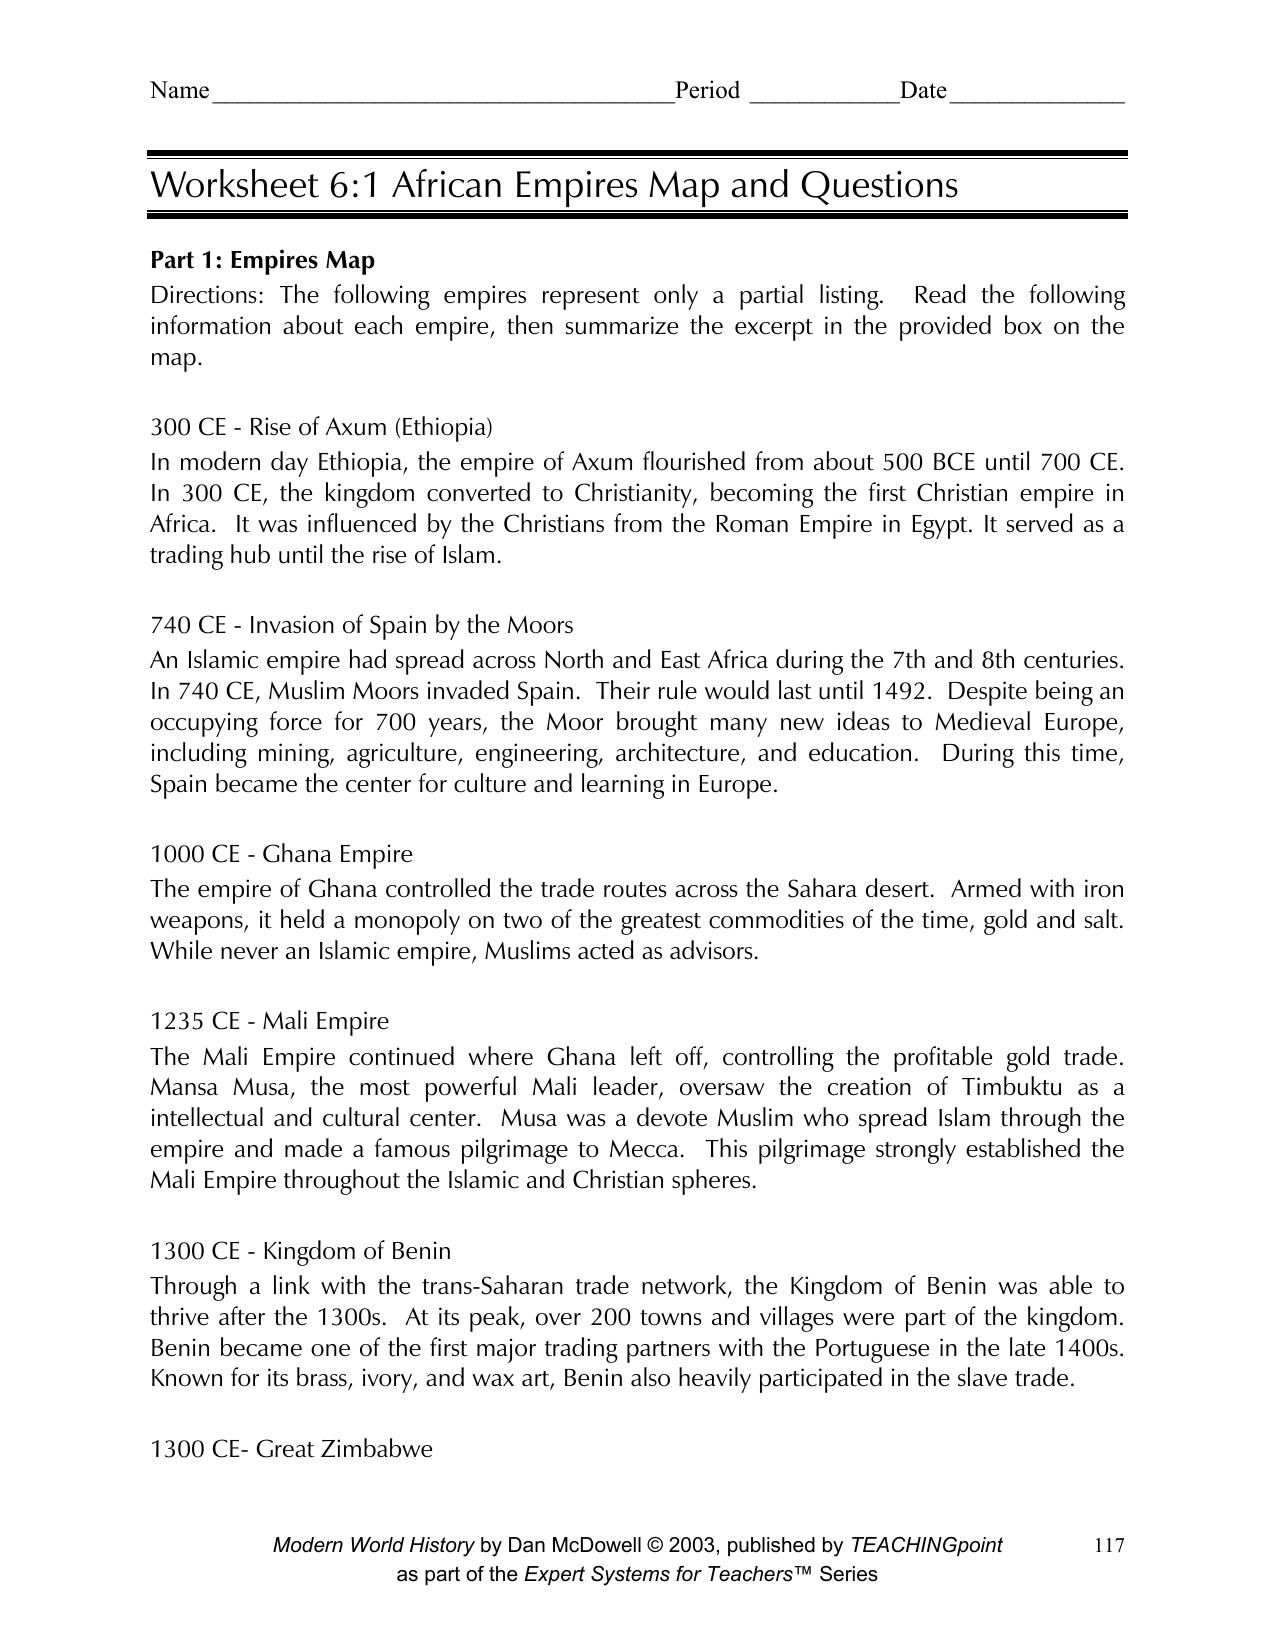 Distribution agreement essay